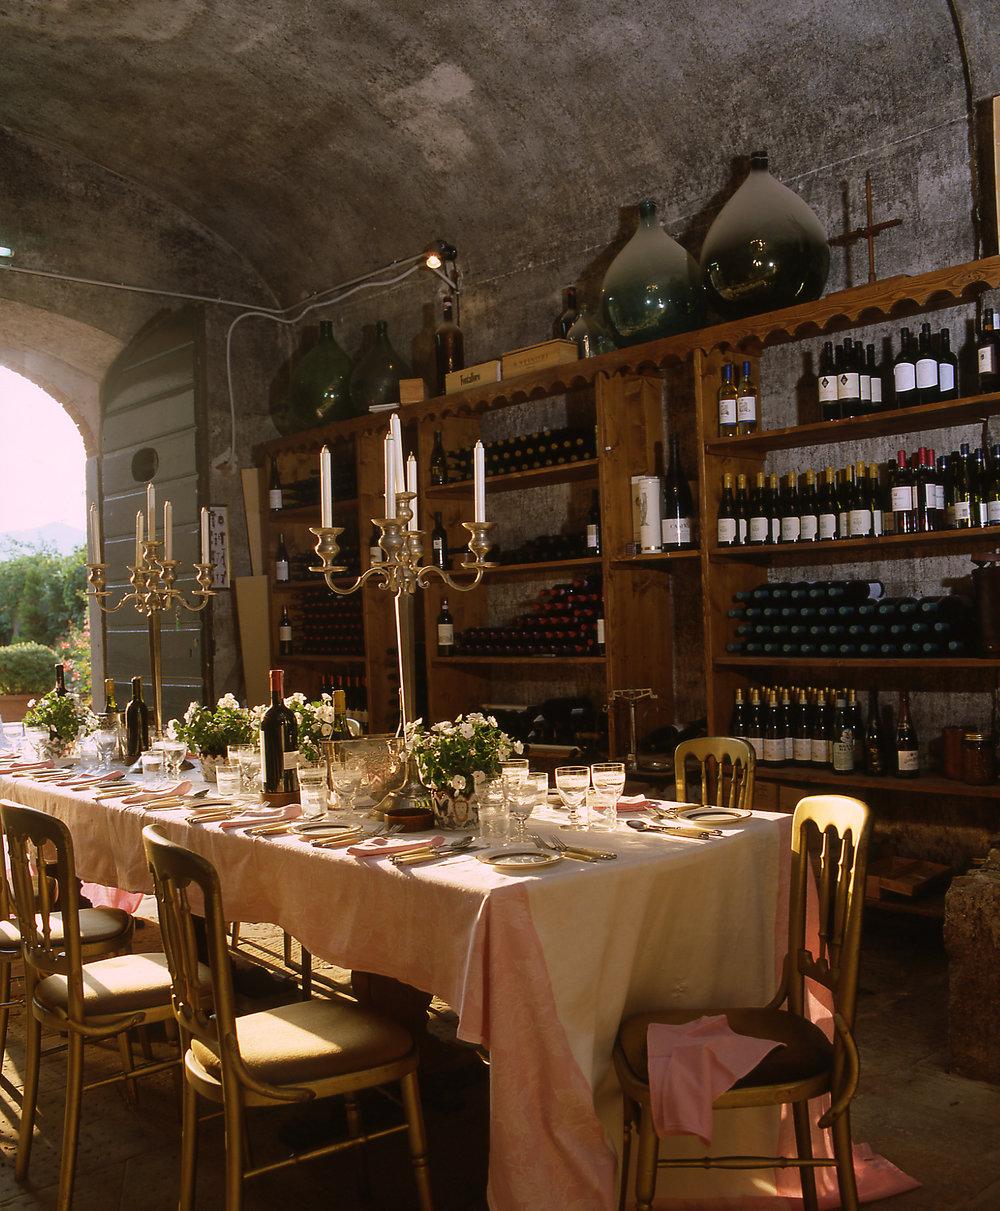 Dining room at Yoga retreat, Italy